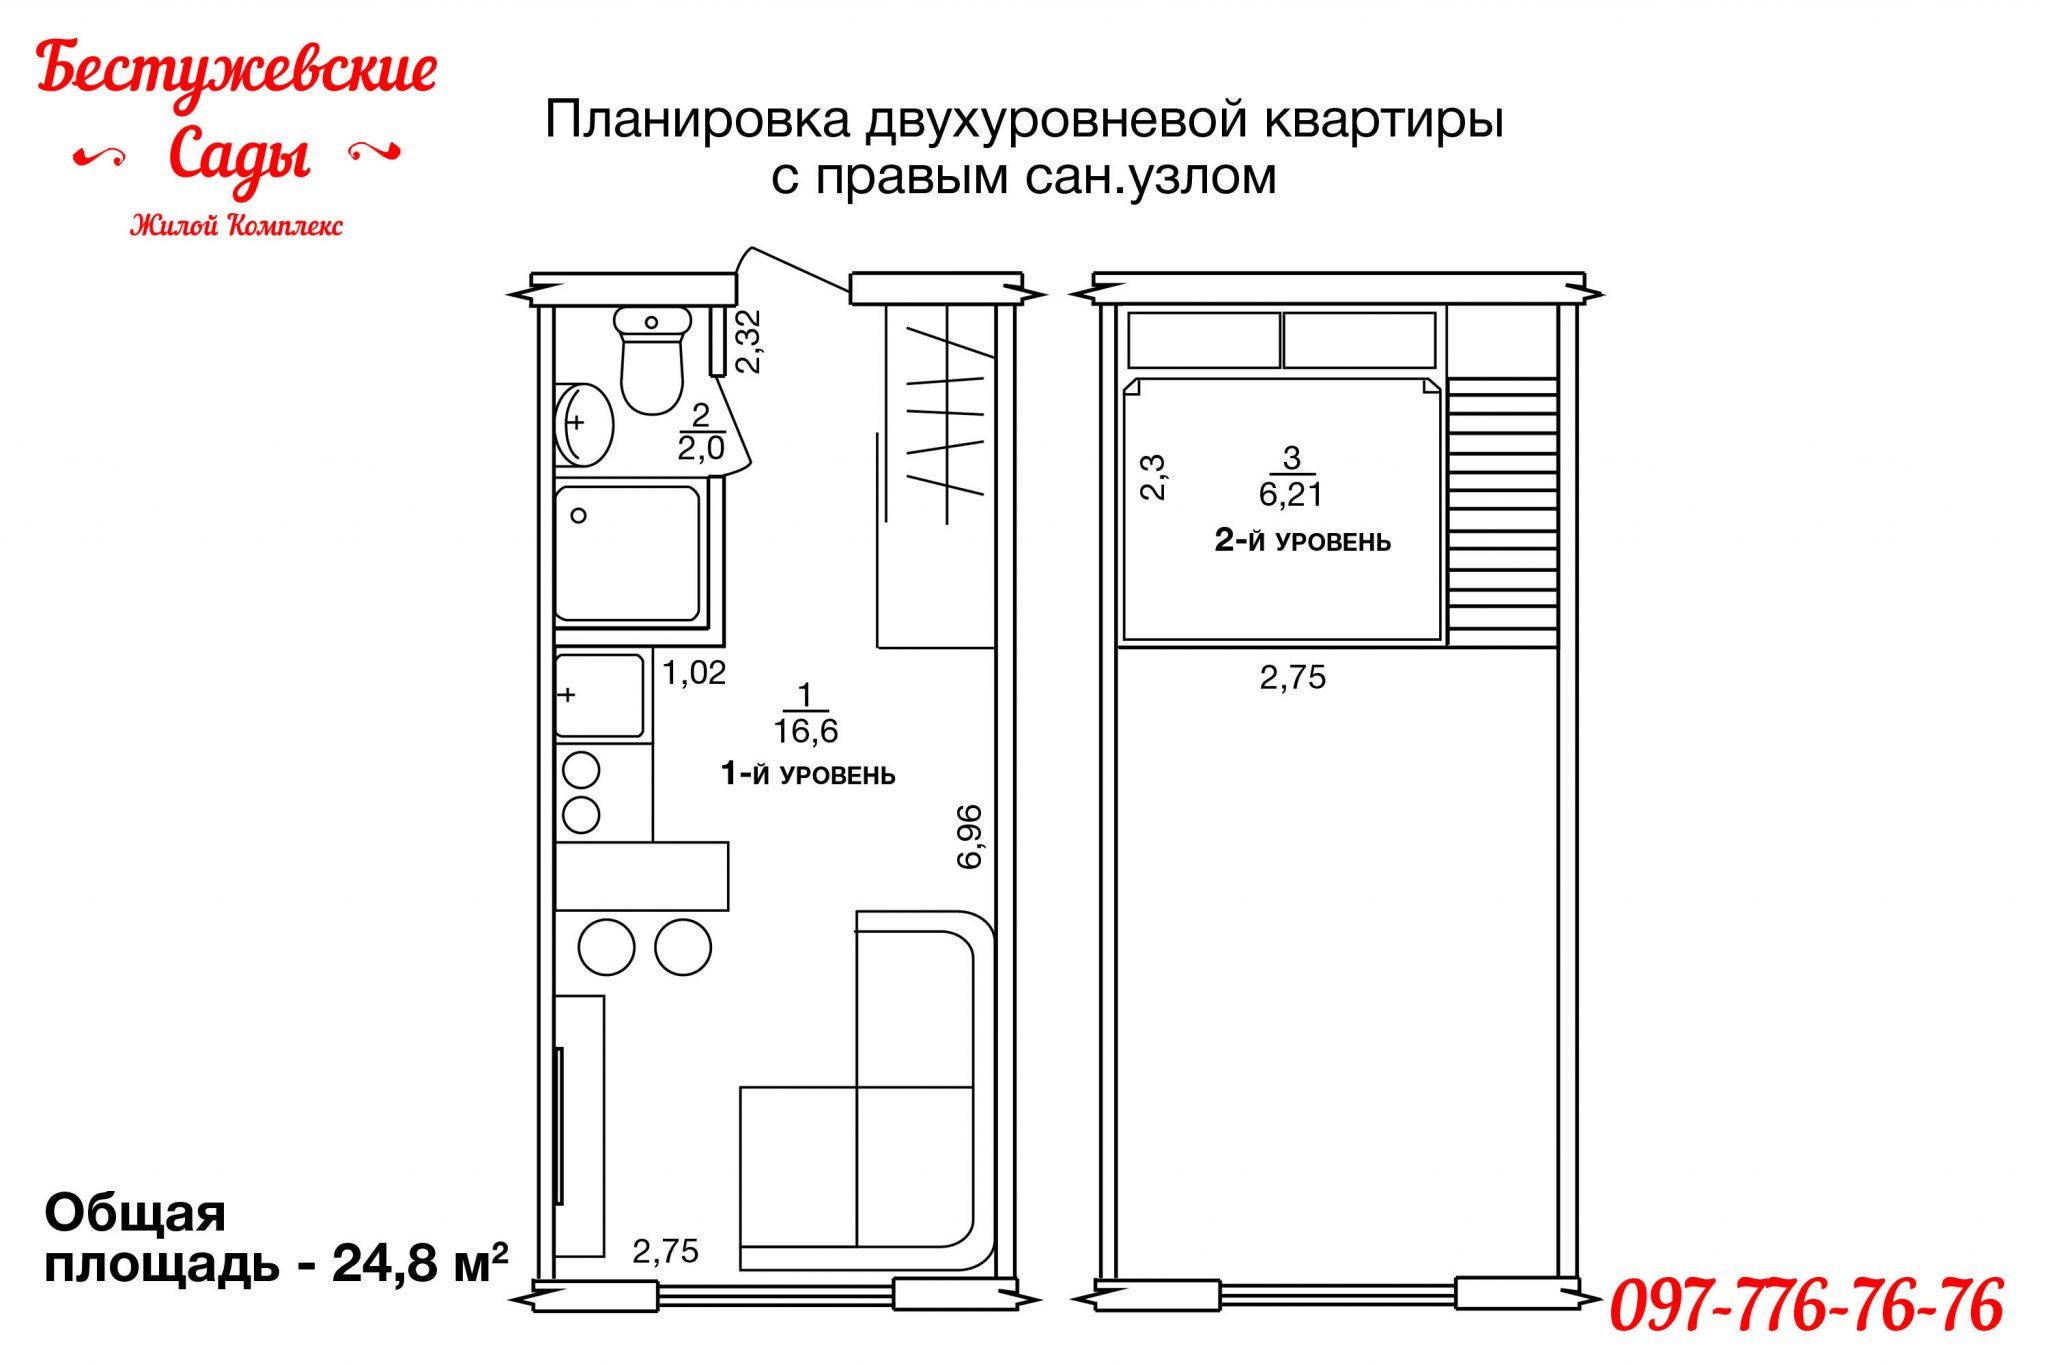 Двухуровневая квартира в Харькове